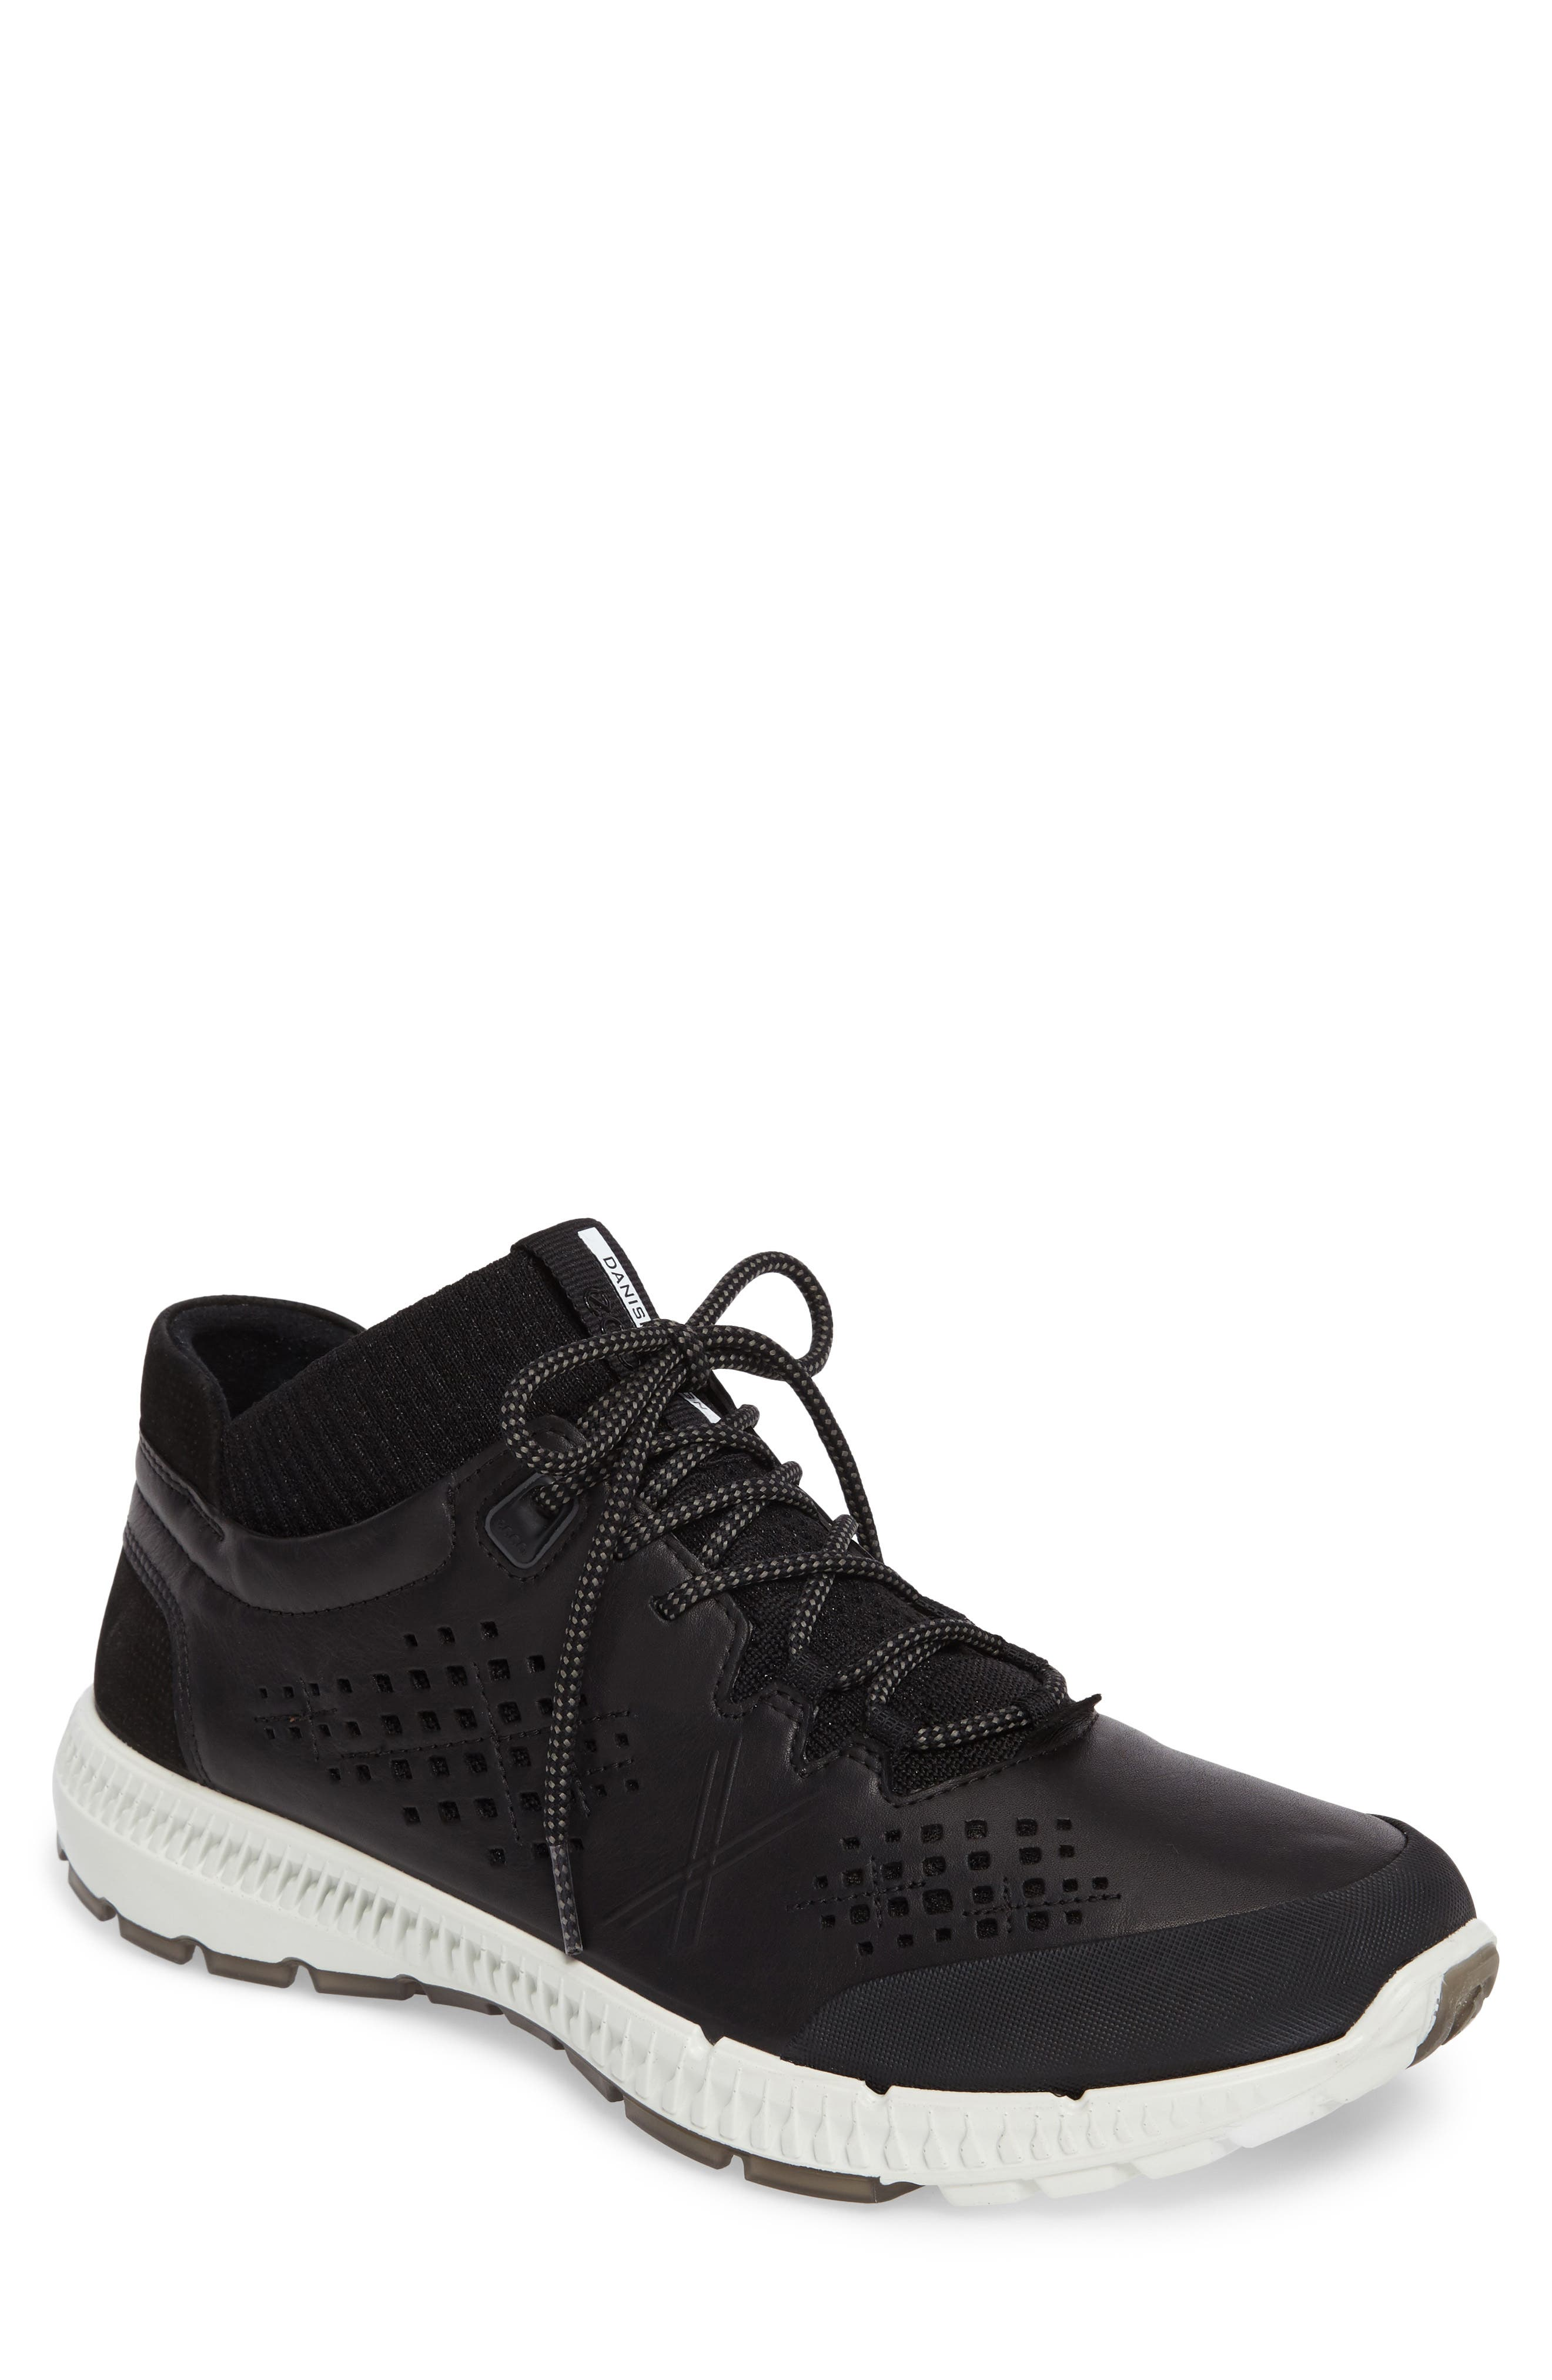 Alternate Image 1 Selected - Ecco Intrinsic Mid Sneaker (Men)